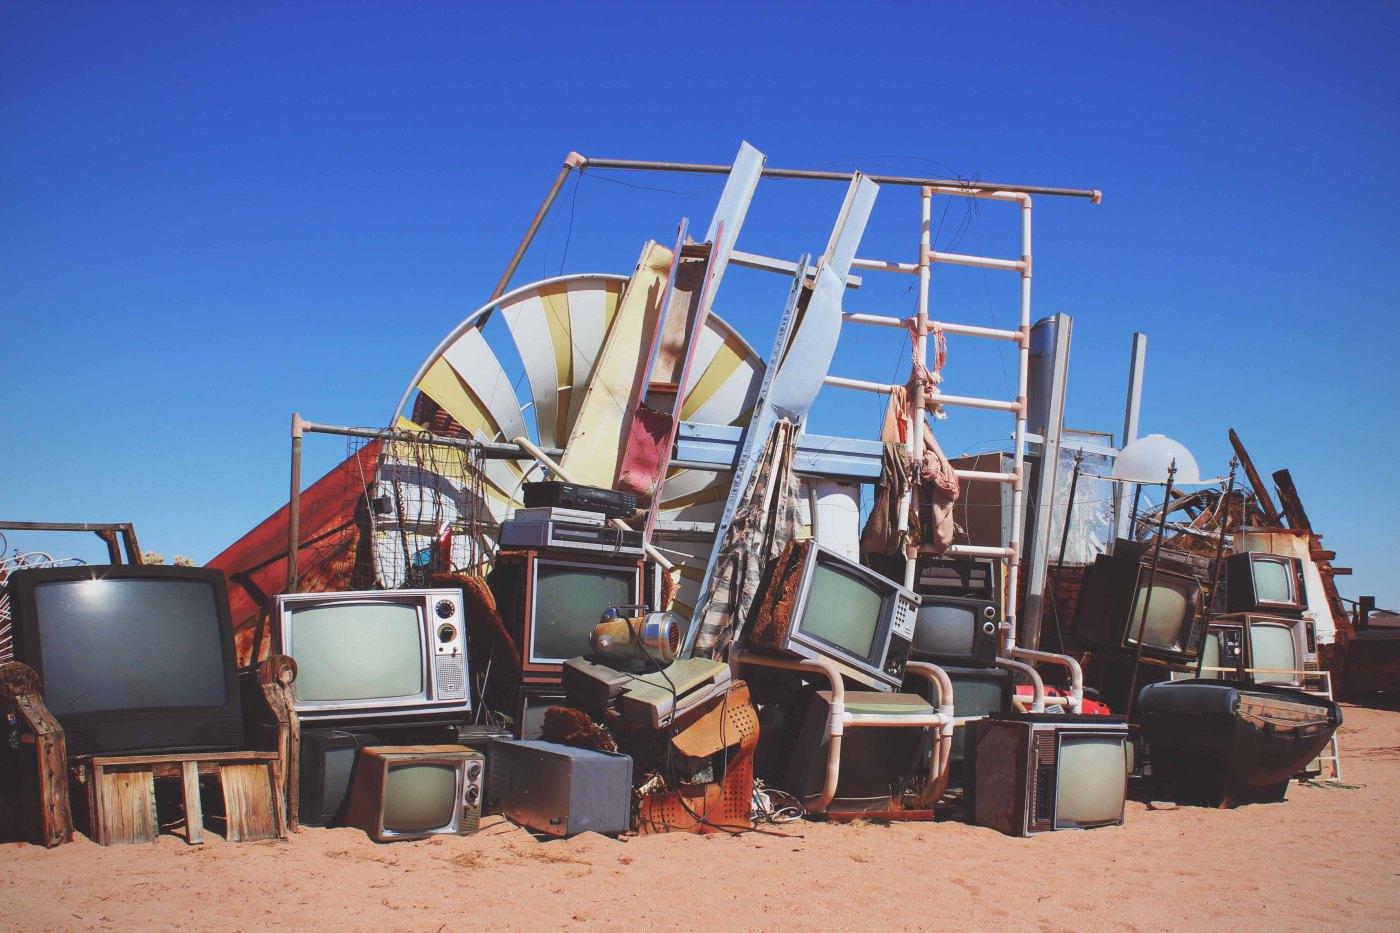 Adiós a la era de las pantallas. FOTO: ANN KATHRIN BOPP.